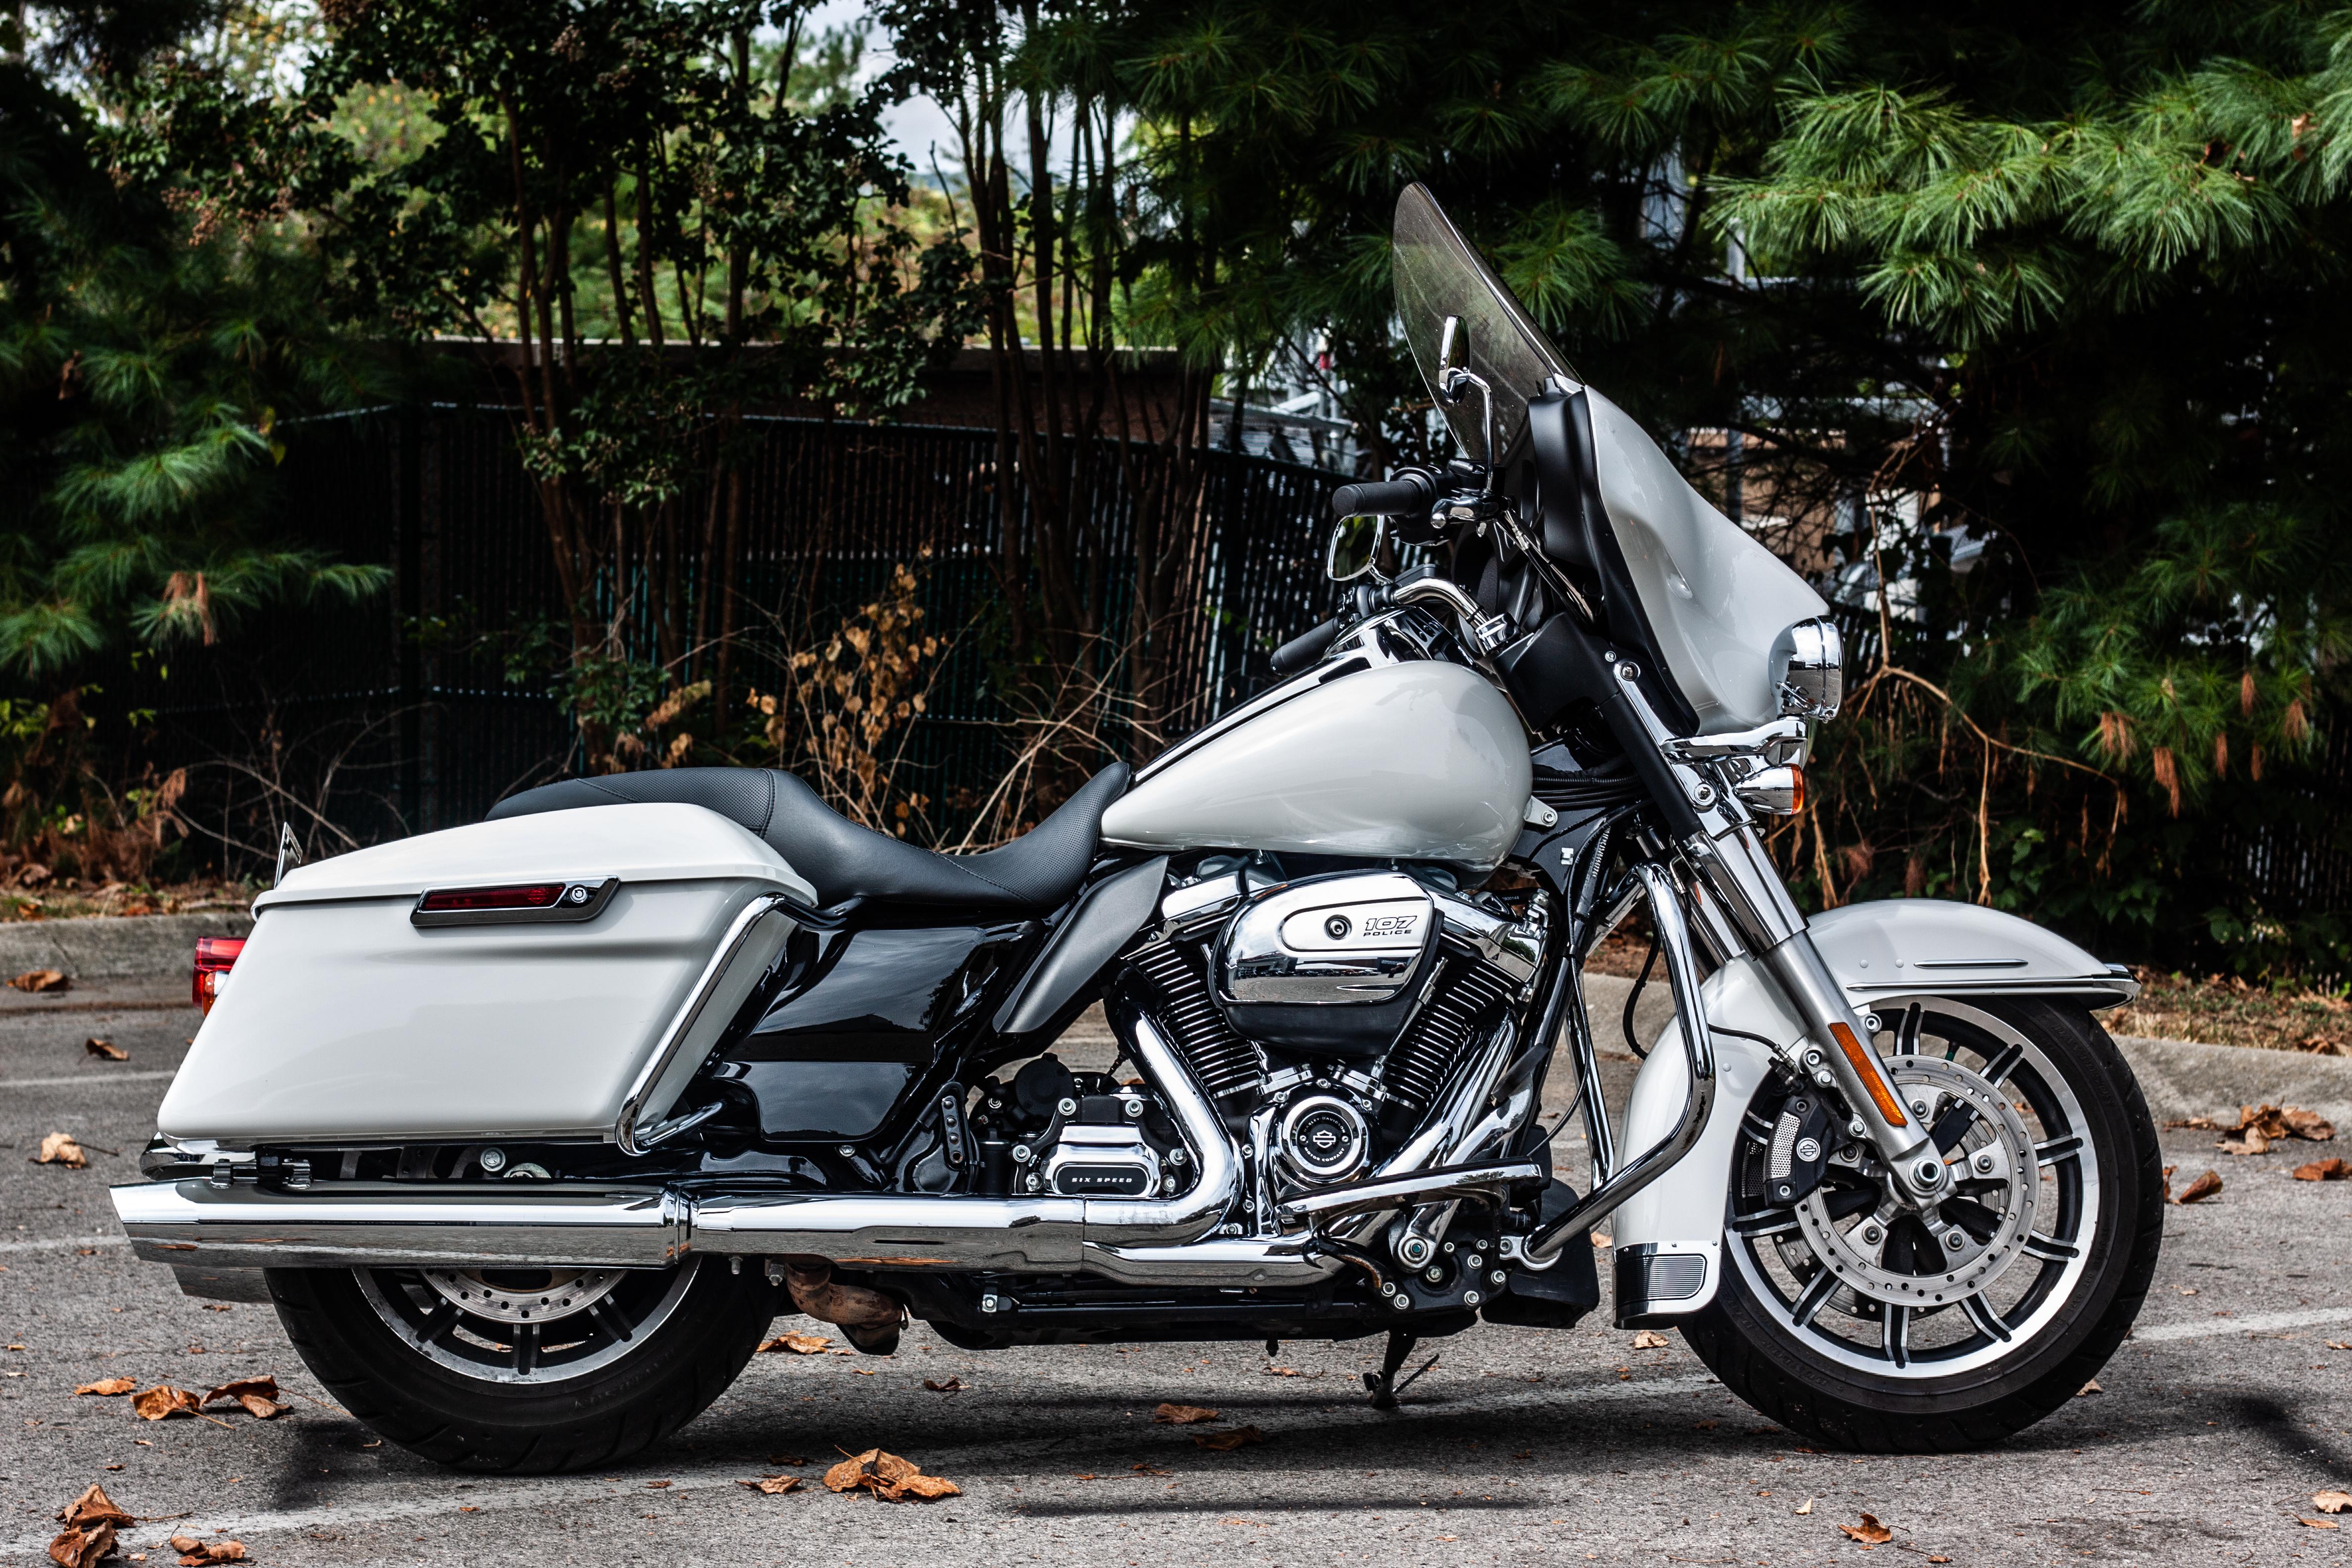 Pre-Owned 2018 Harley-Davidson Electra Glide Police